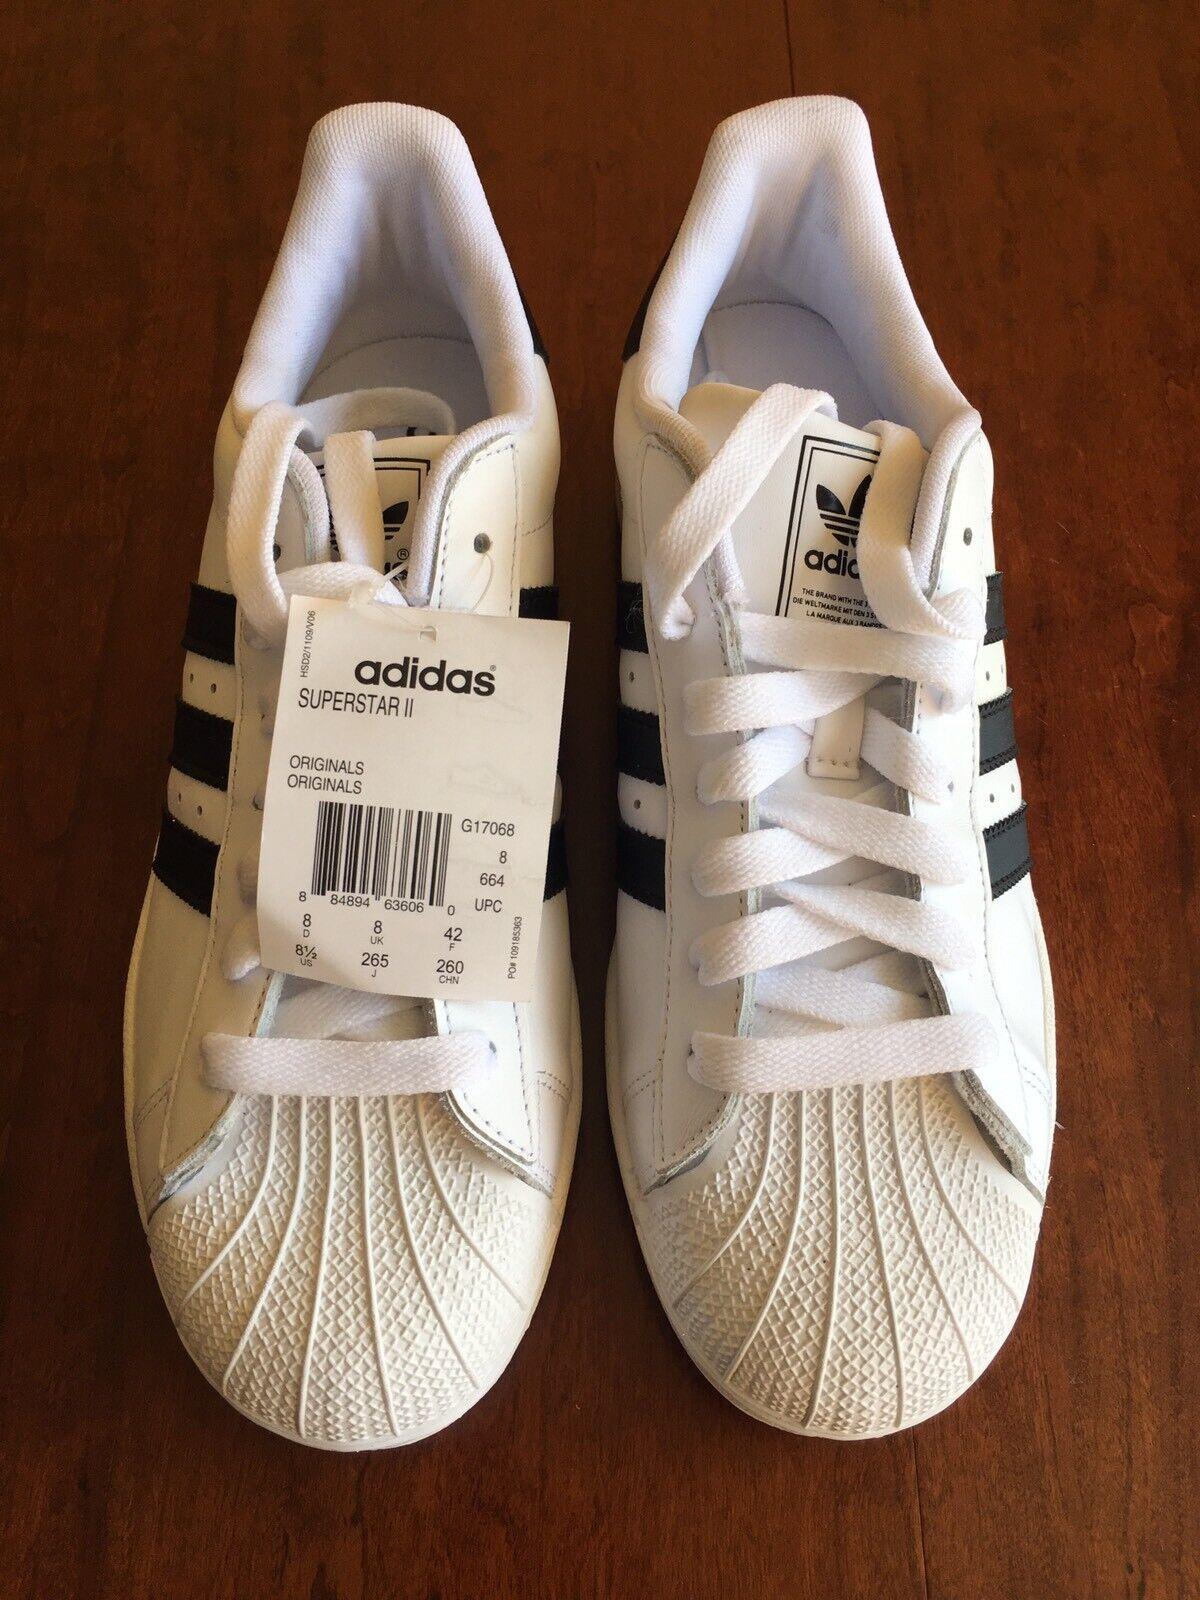 New With Tag, Adidas Originals Men's Superstar ll Sneaker US Men's Size 8 1 2